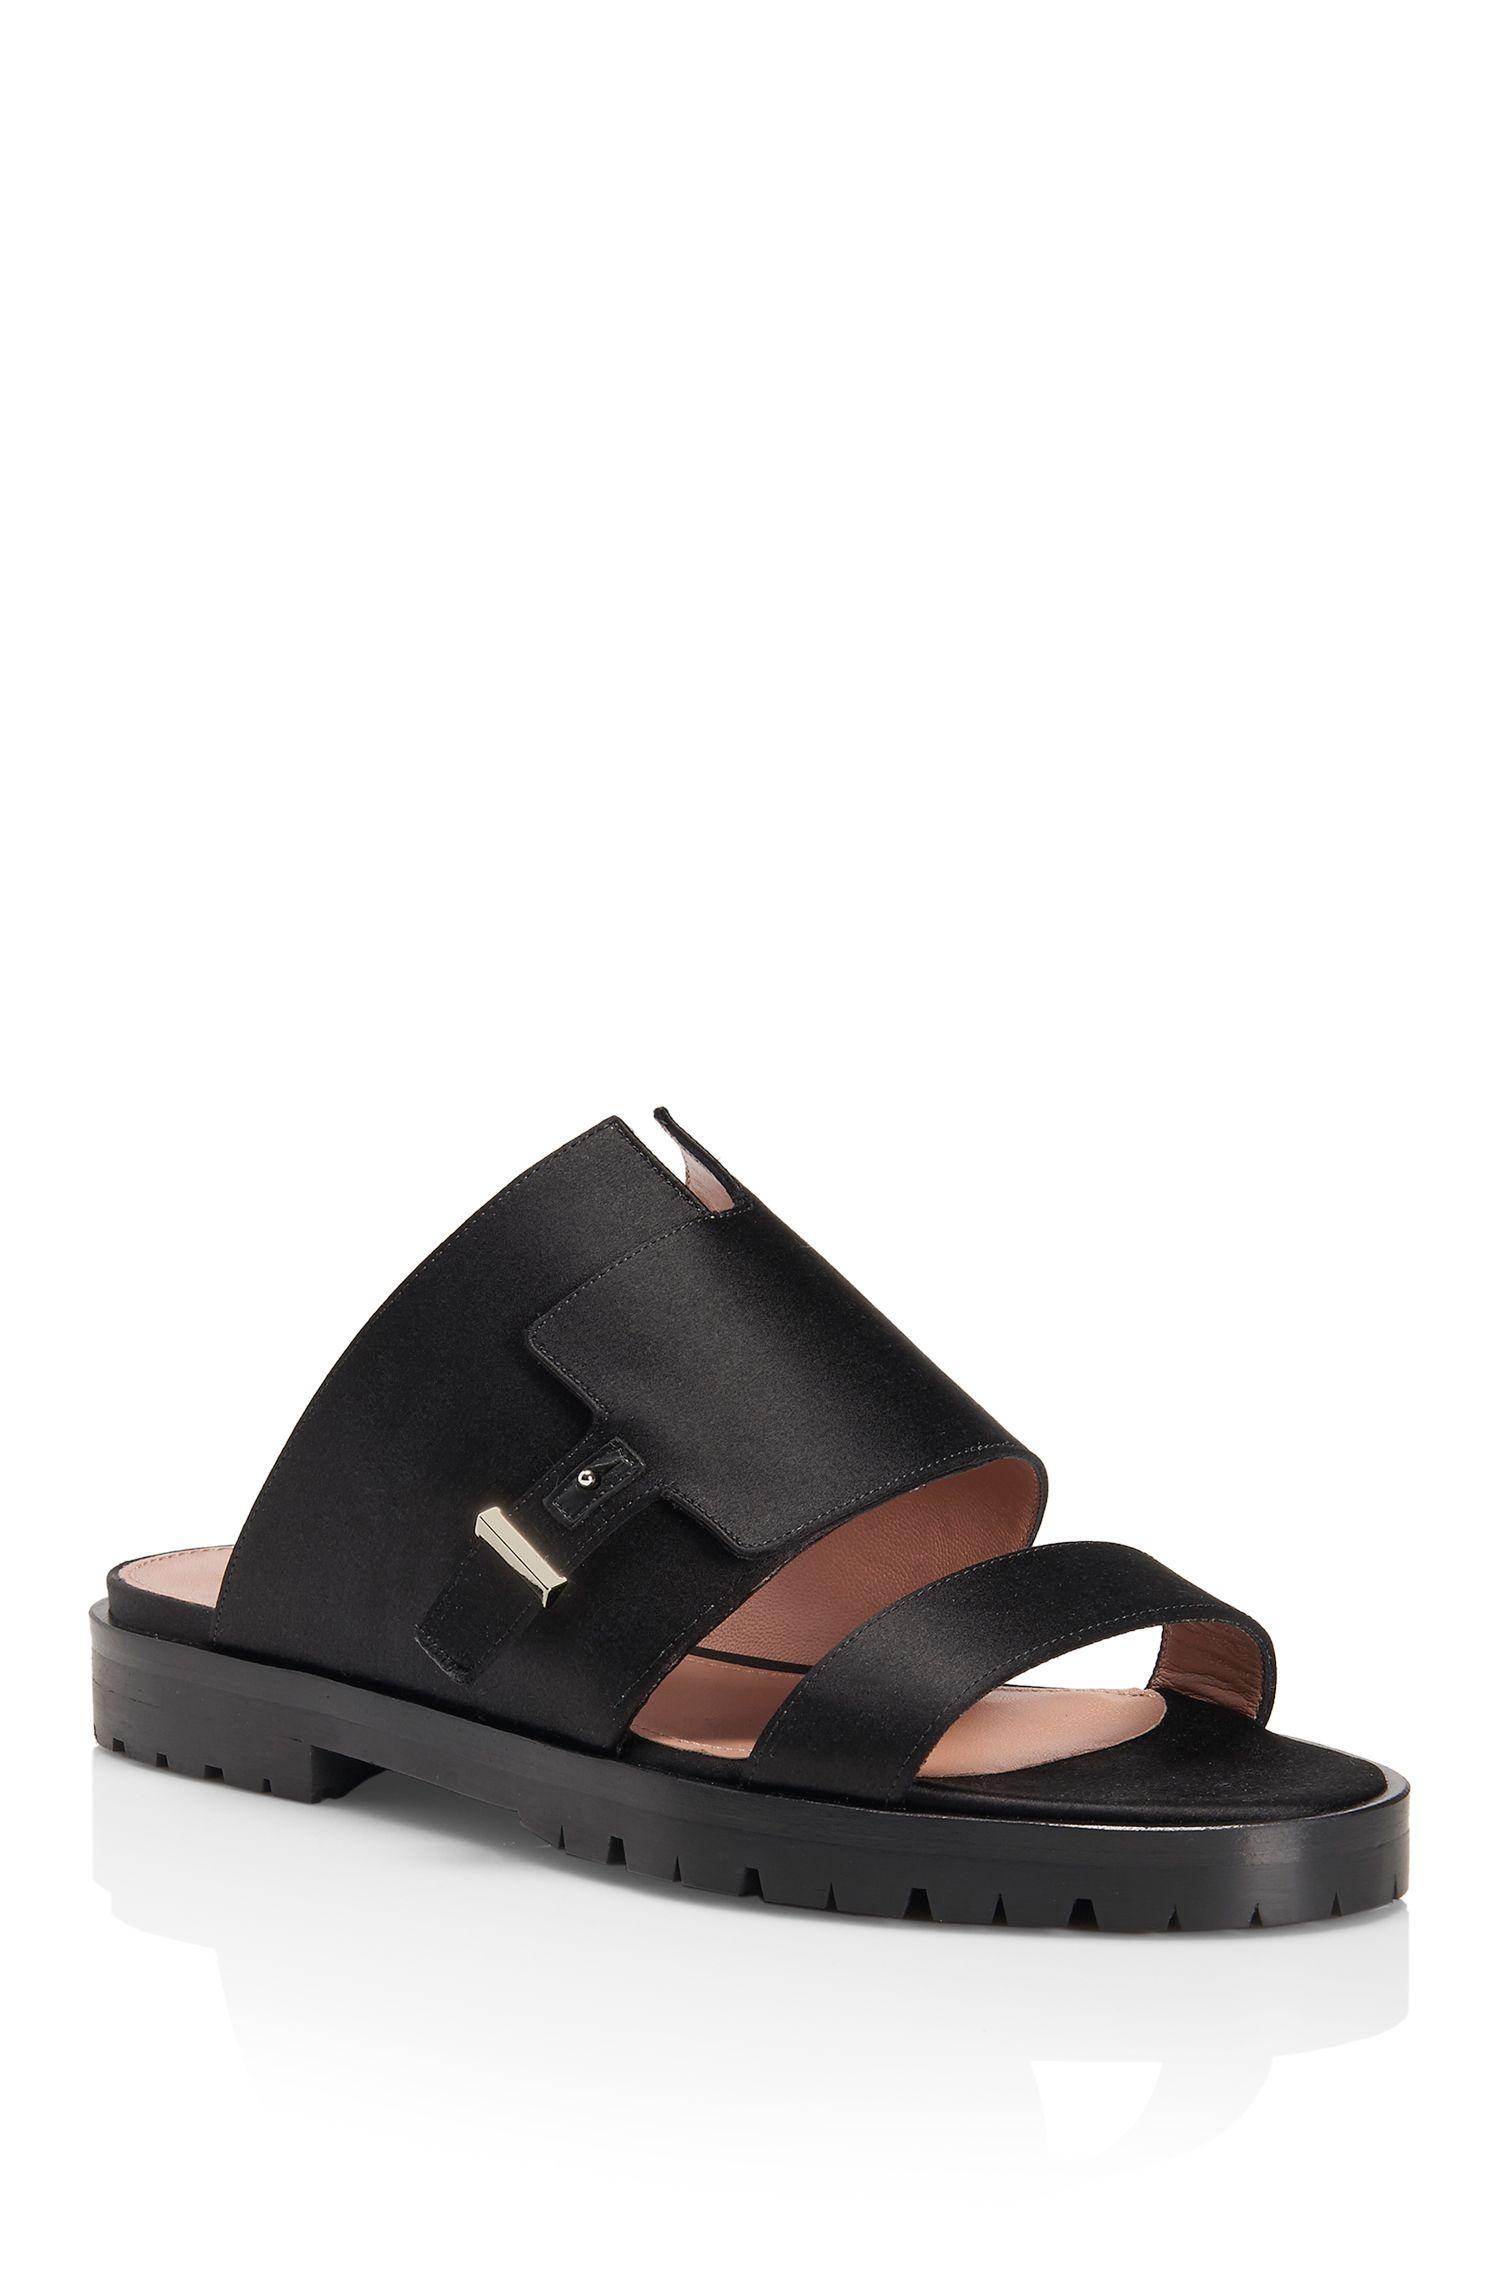 'Sandal Pin Flat' | Silk Blend Satin Sandals